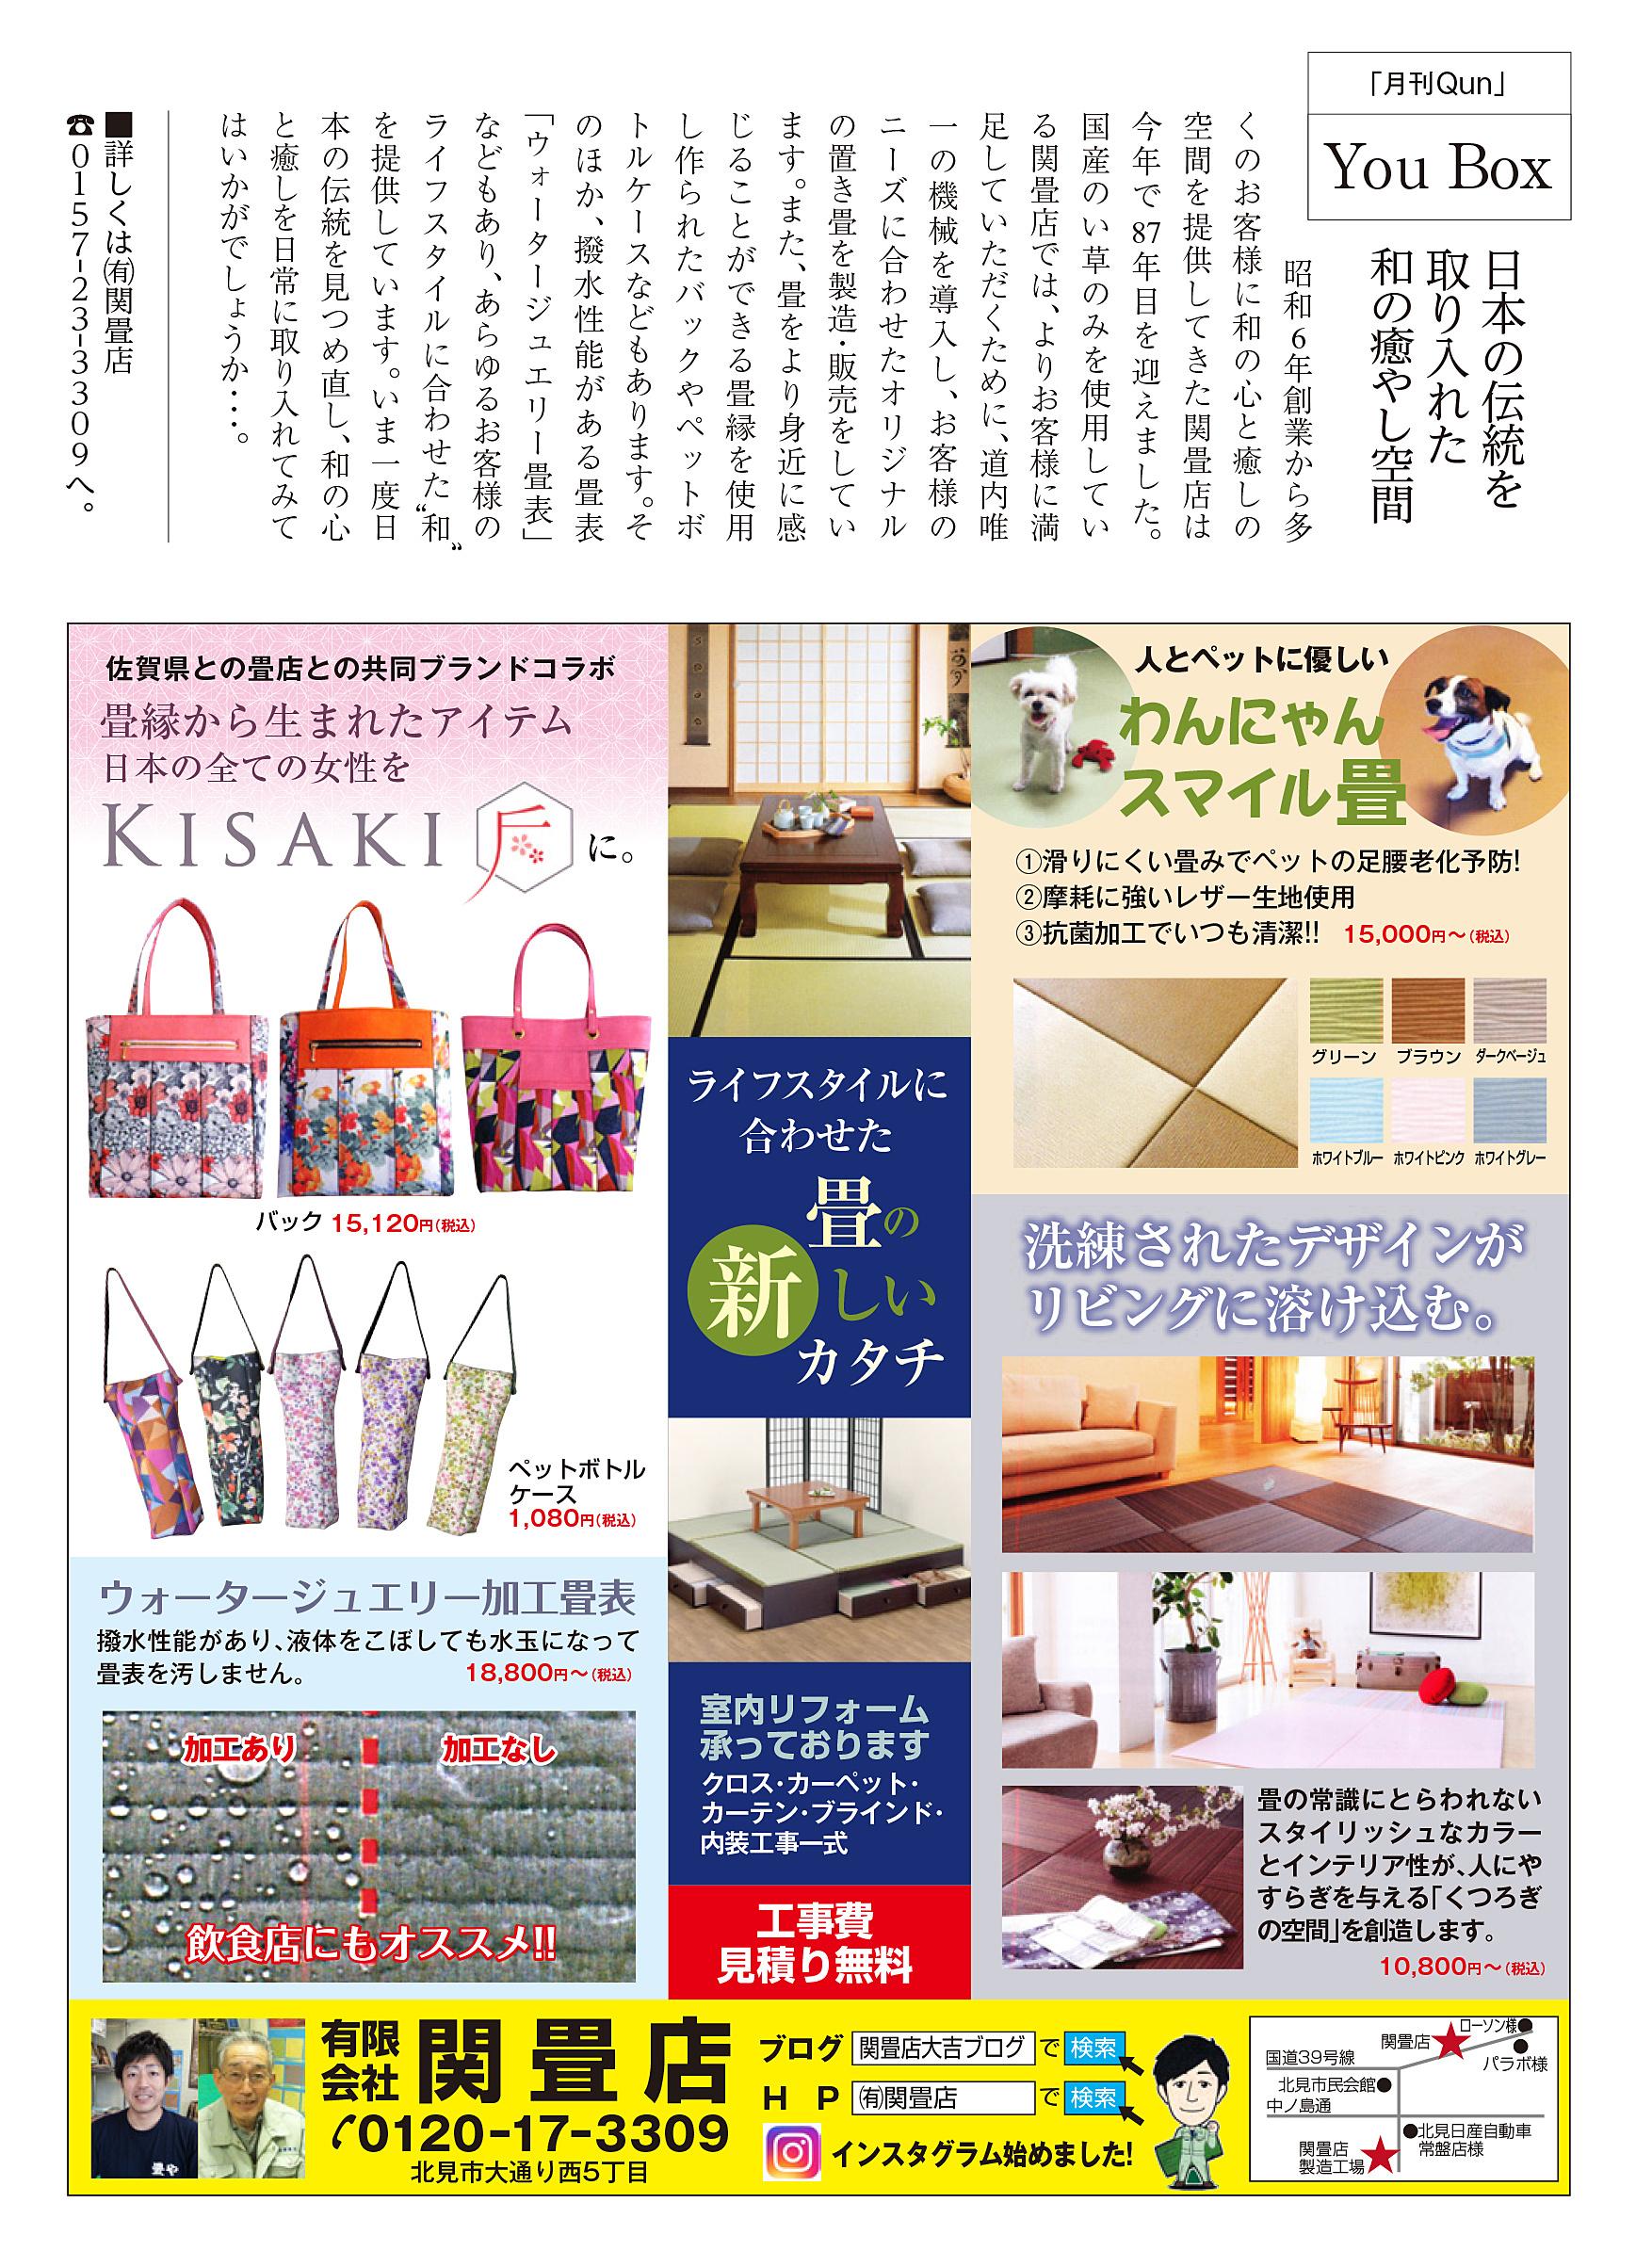 https://seki-tatami.com/files/libs/77/201805301112084790.jpg